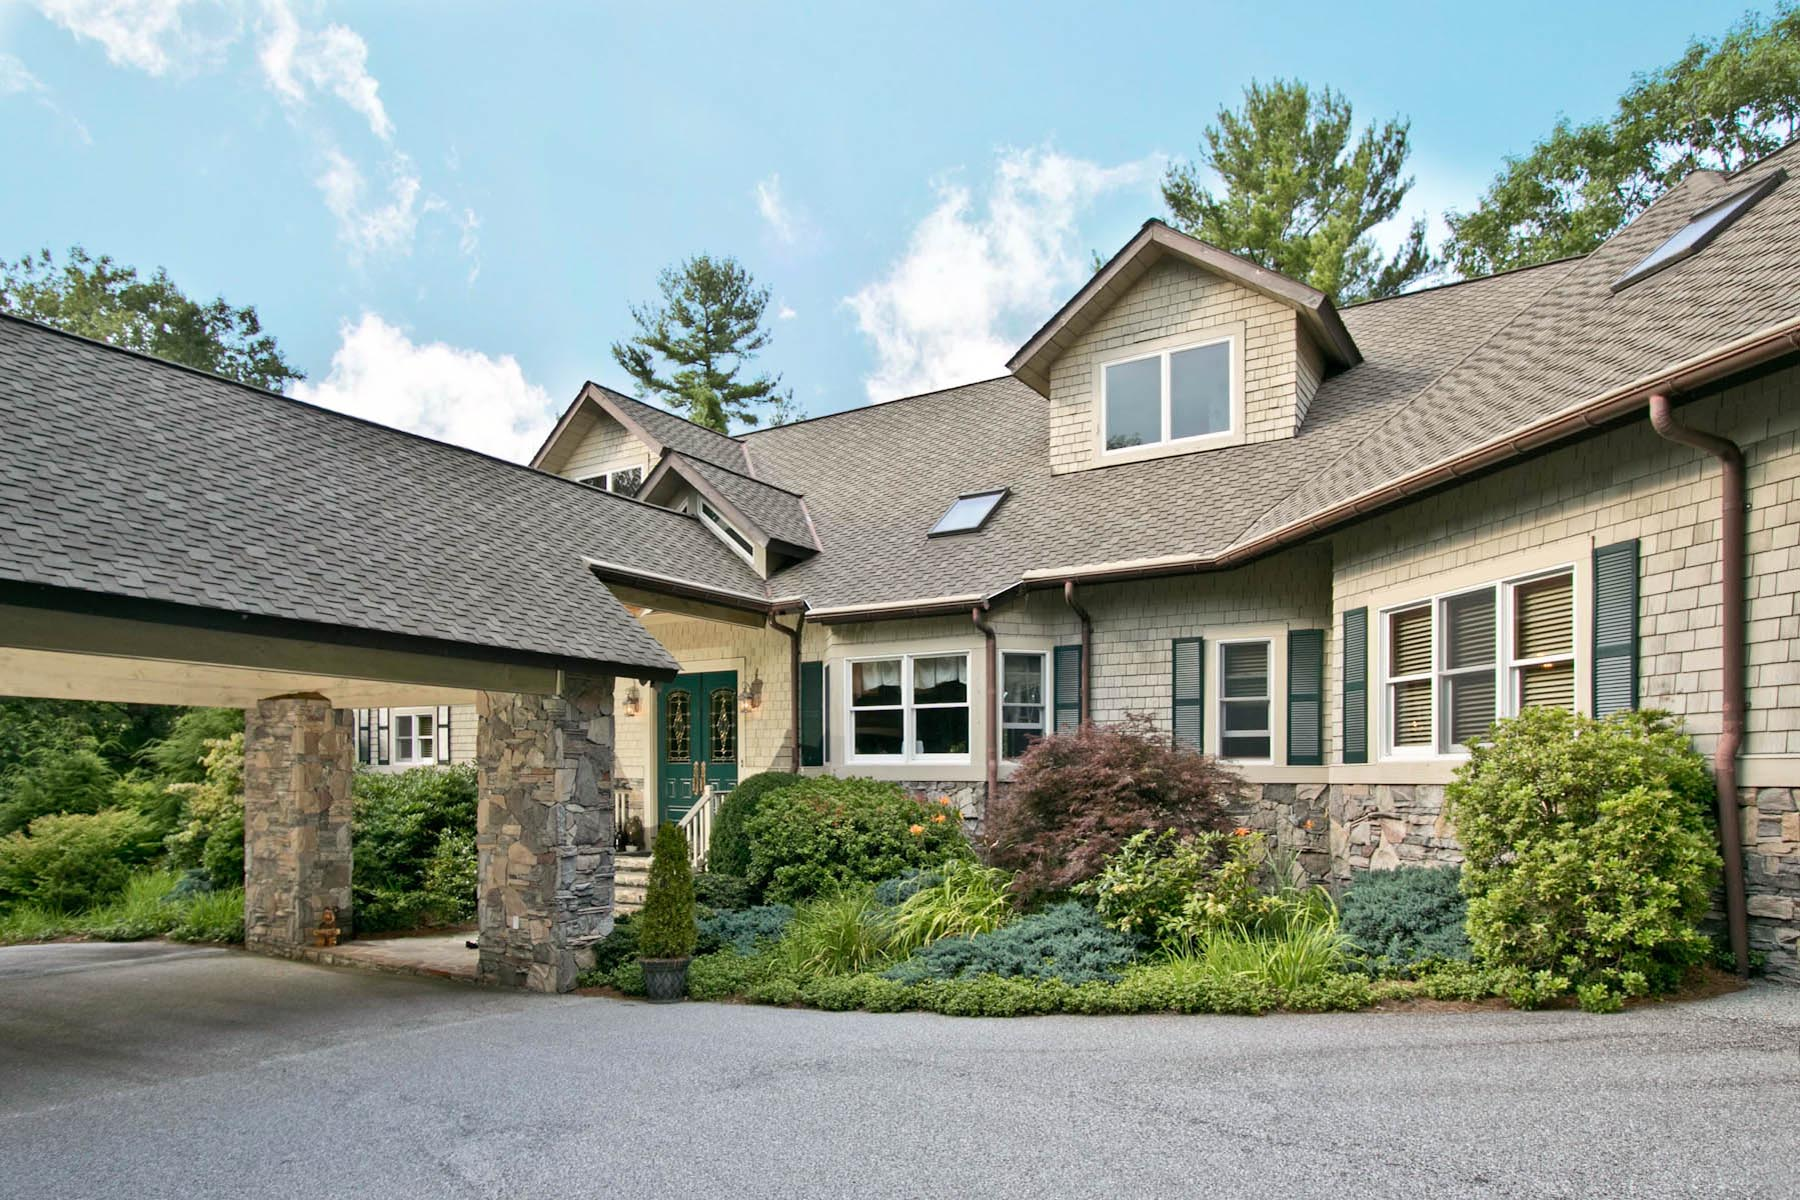 Single Family Home for Sale at 1785 Cullasaja Club 1785 Cullasaja Club Drive Highlands, North Carolina, 28741 United States